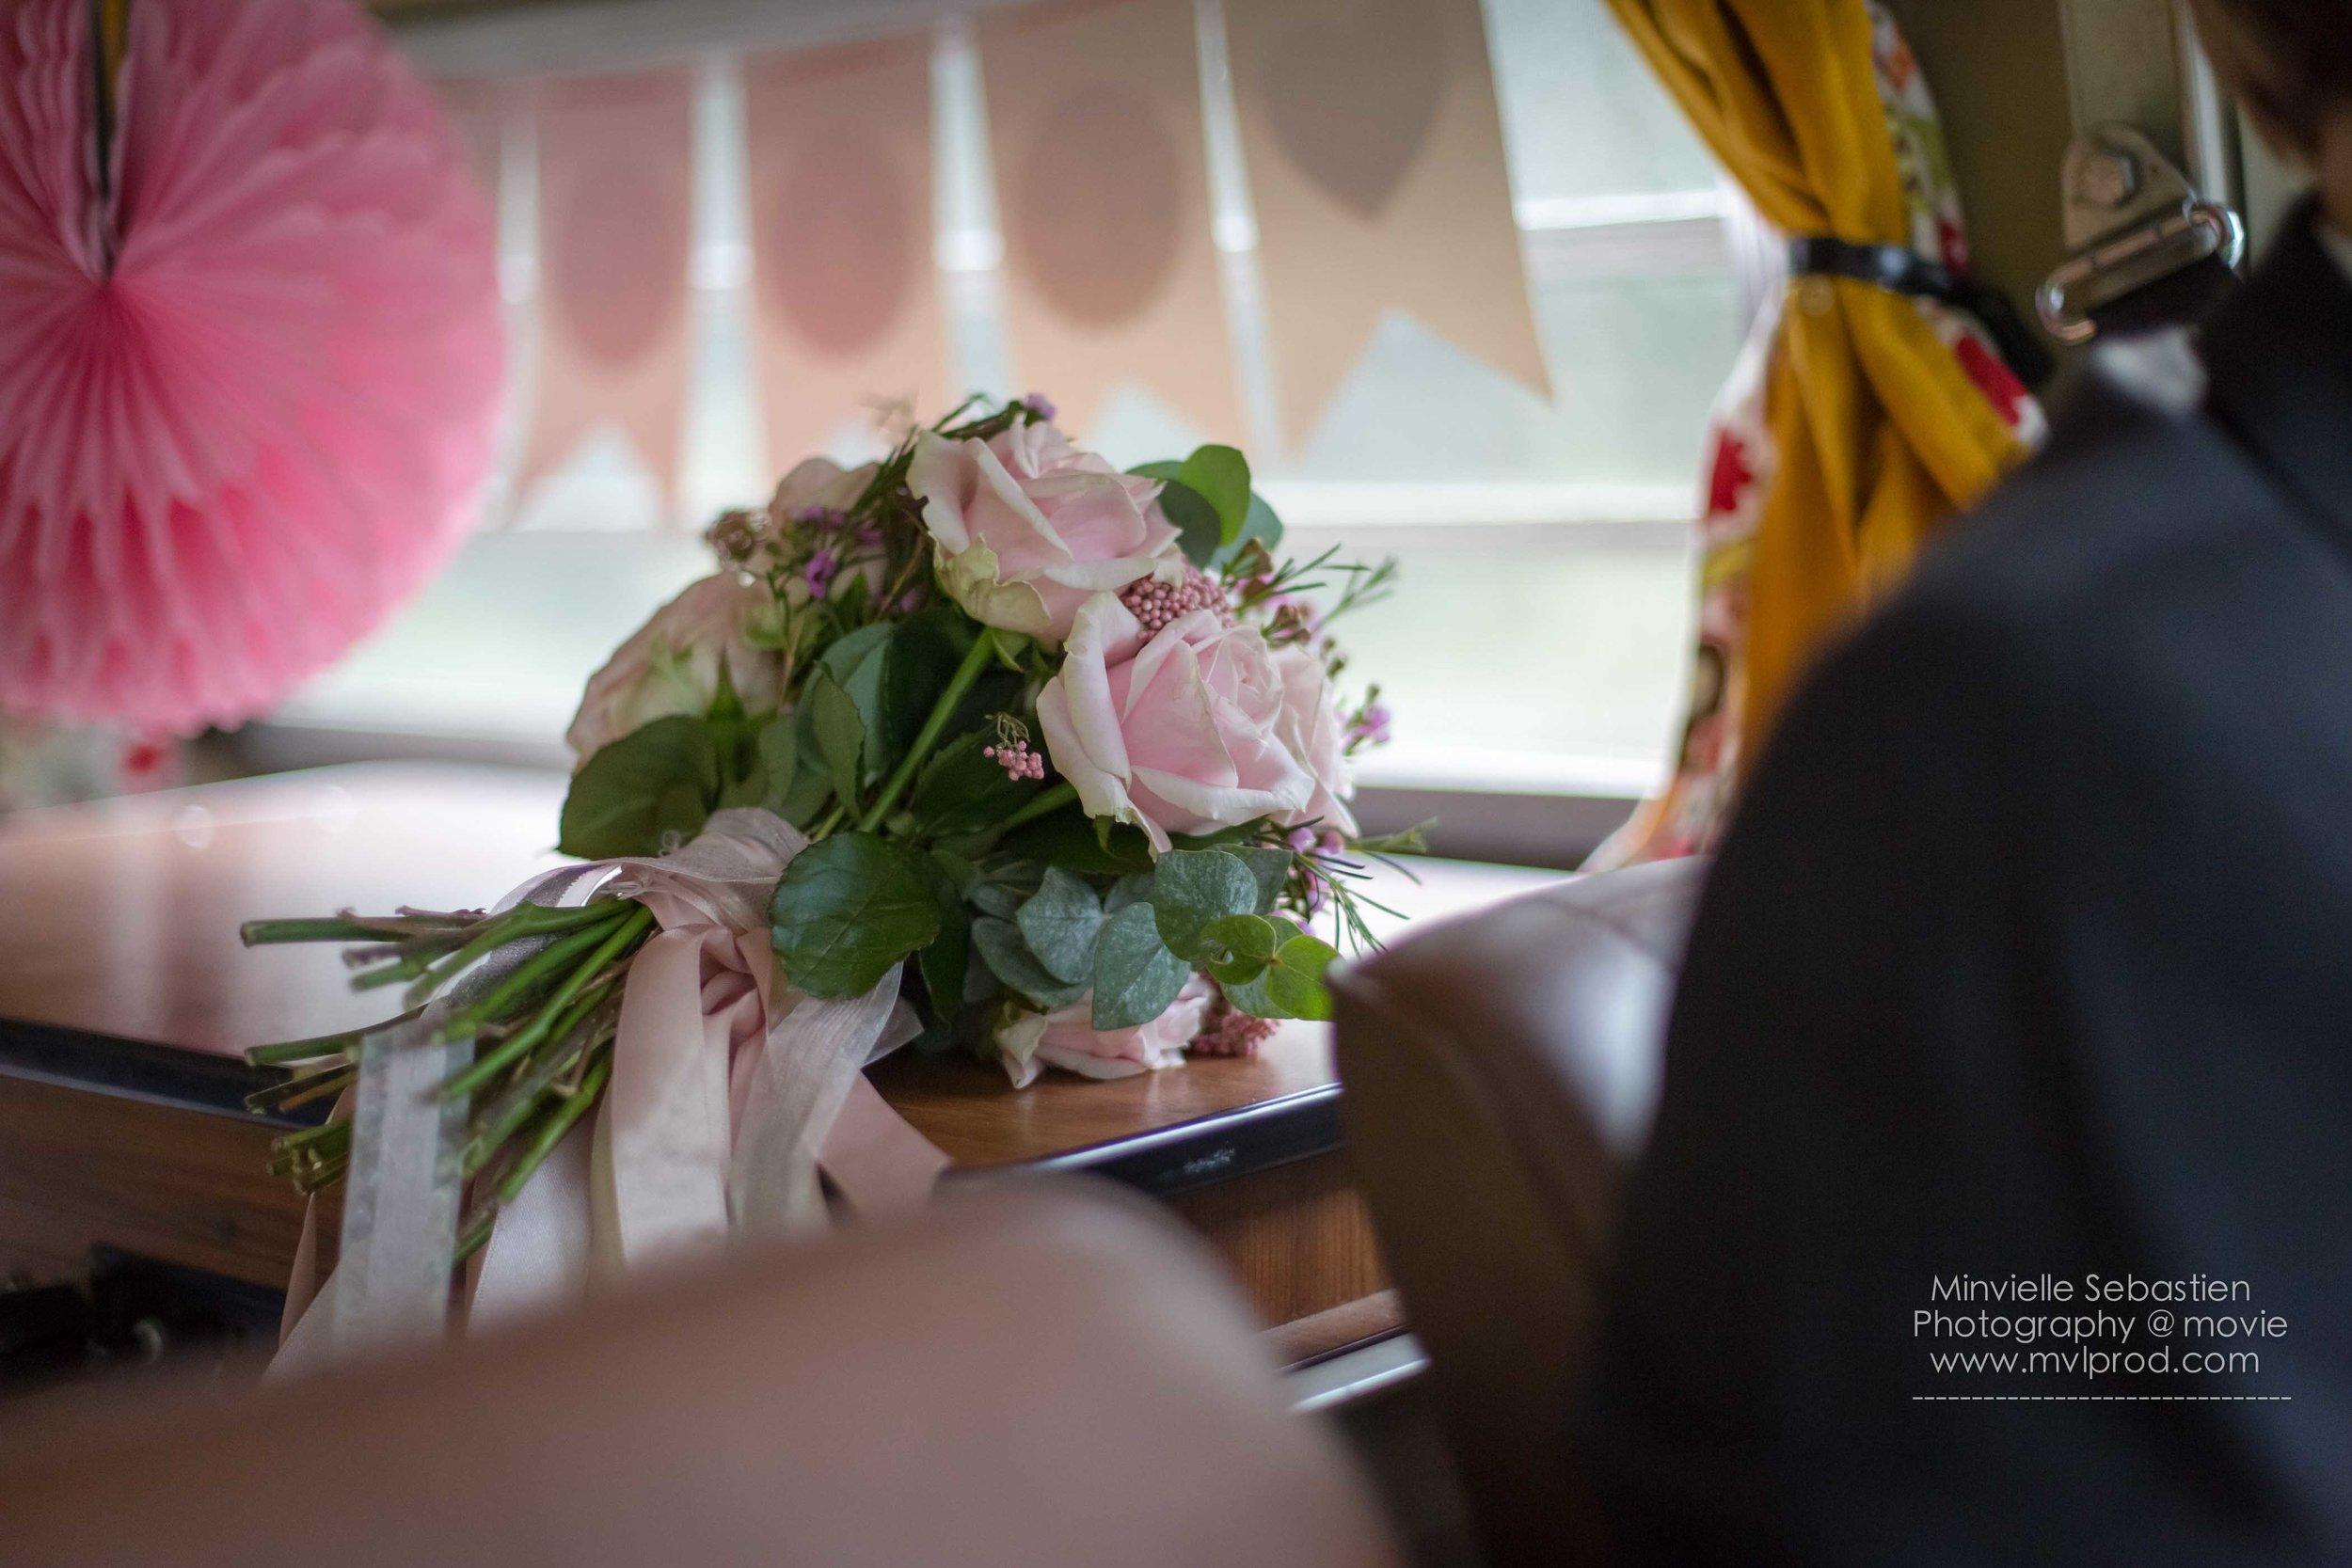 decoration-mariage-decoration-mariageIMG_4131.jpg